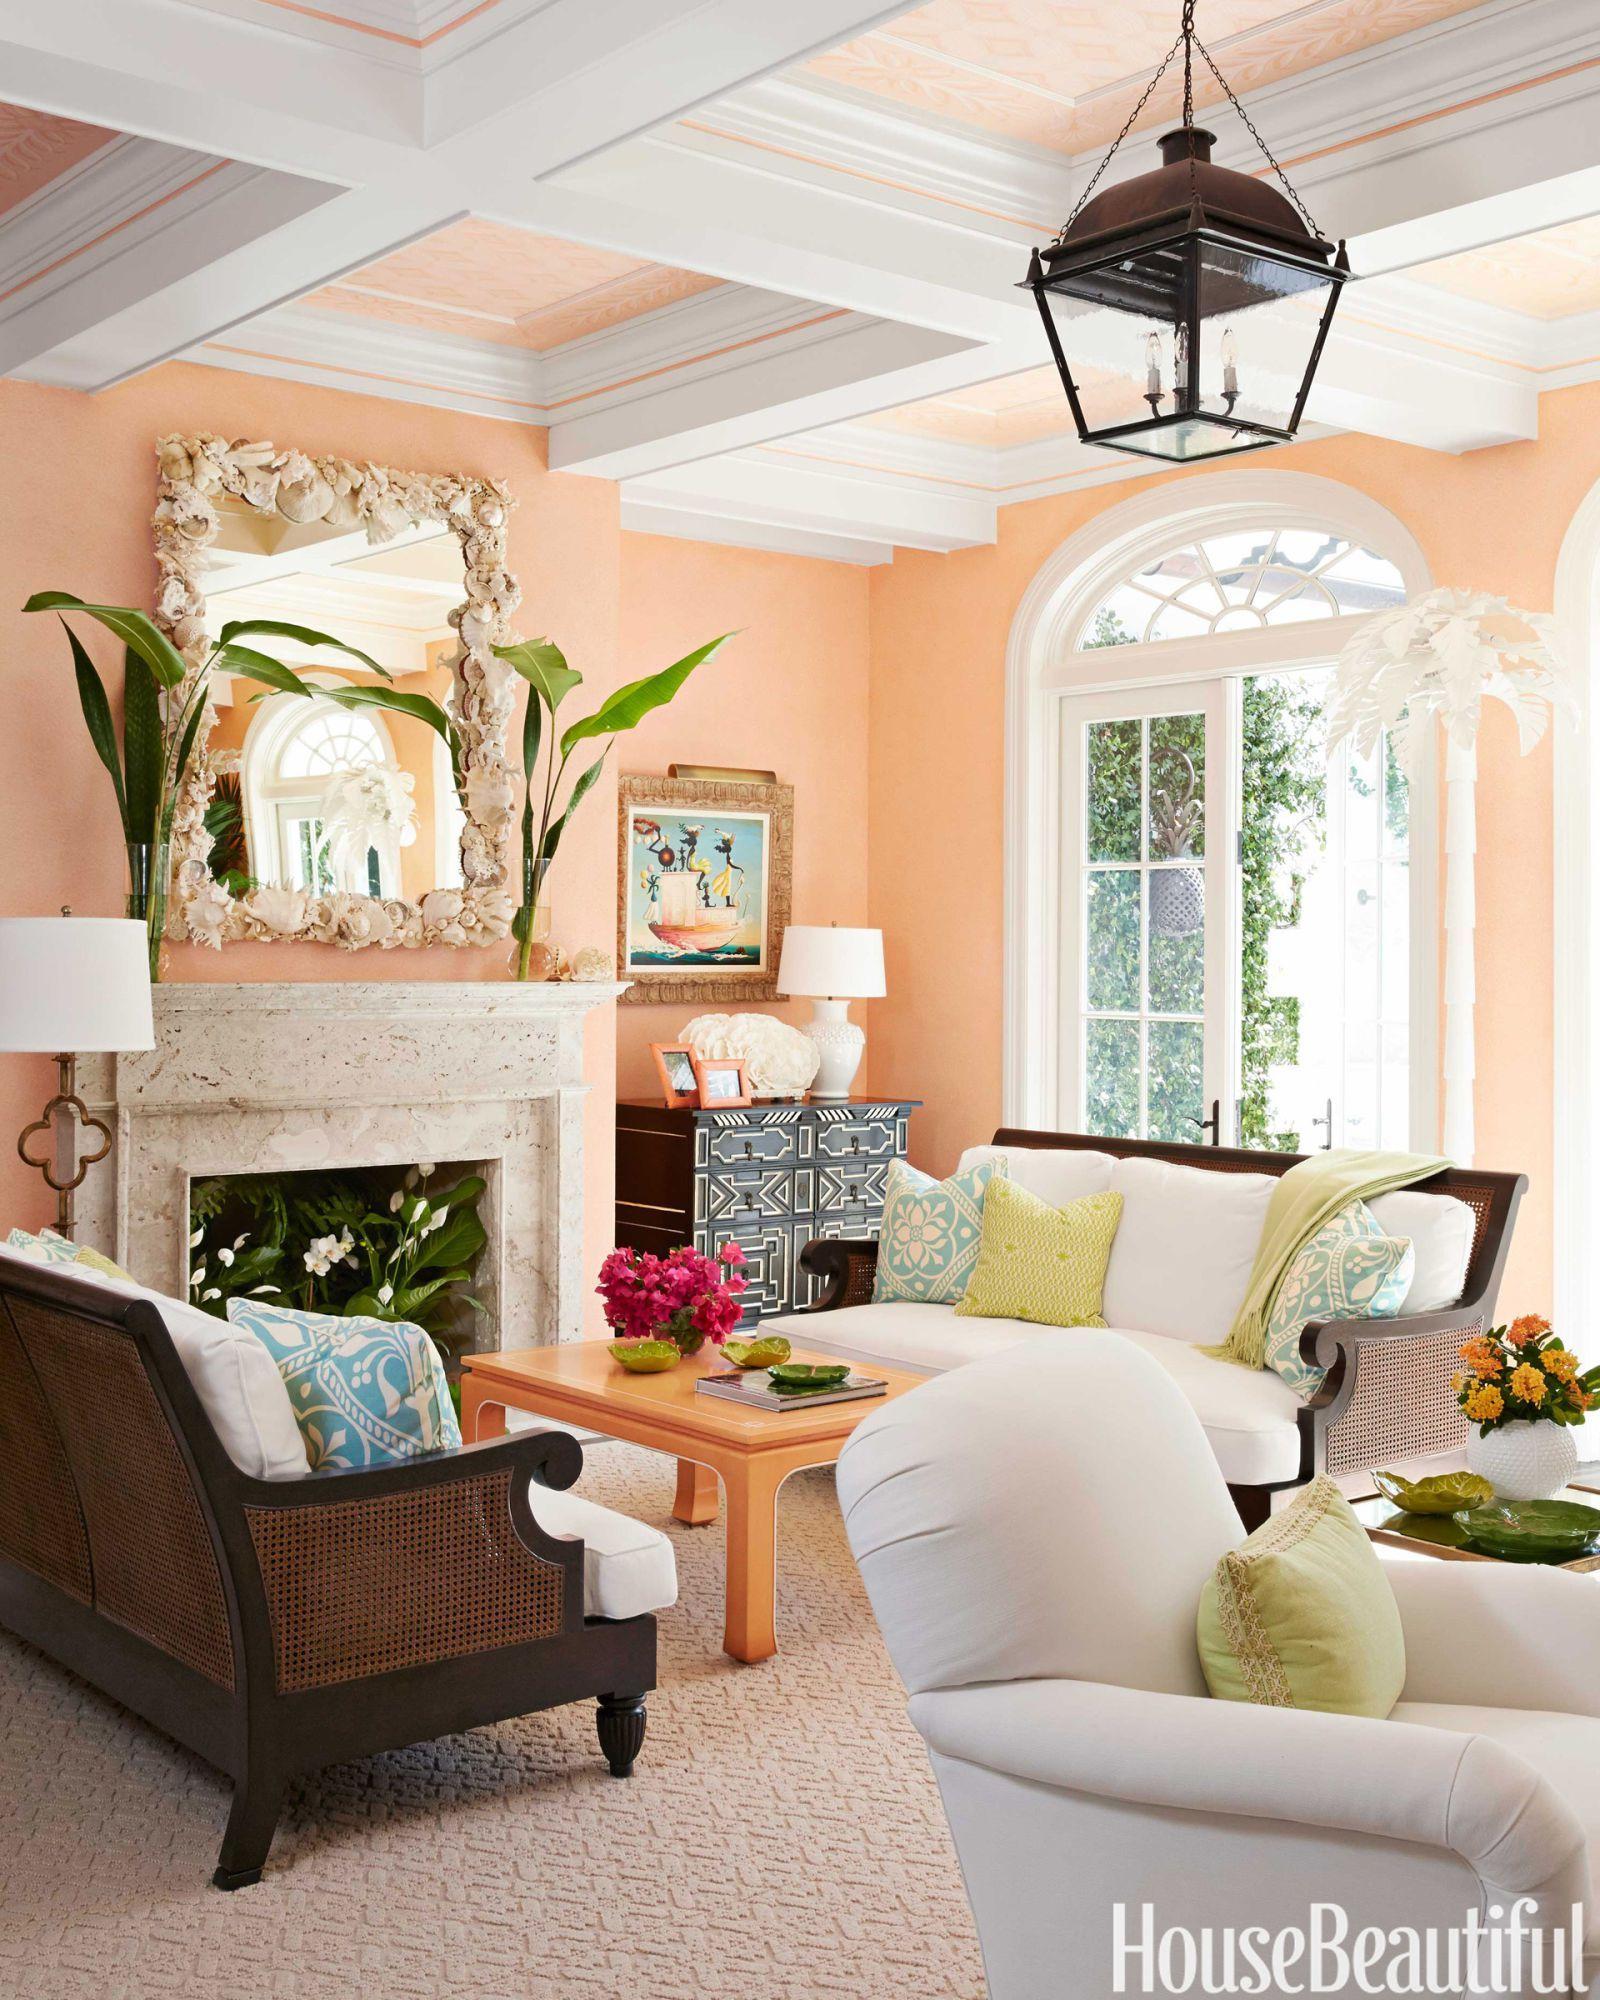 15 best living room color ideas top paint colors for living rooms rh housebeautiful com wall painting living room ideas painting living room ideas color scheme